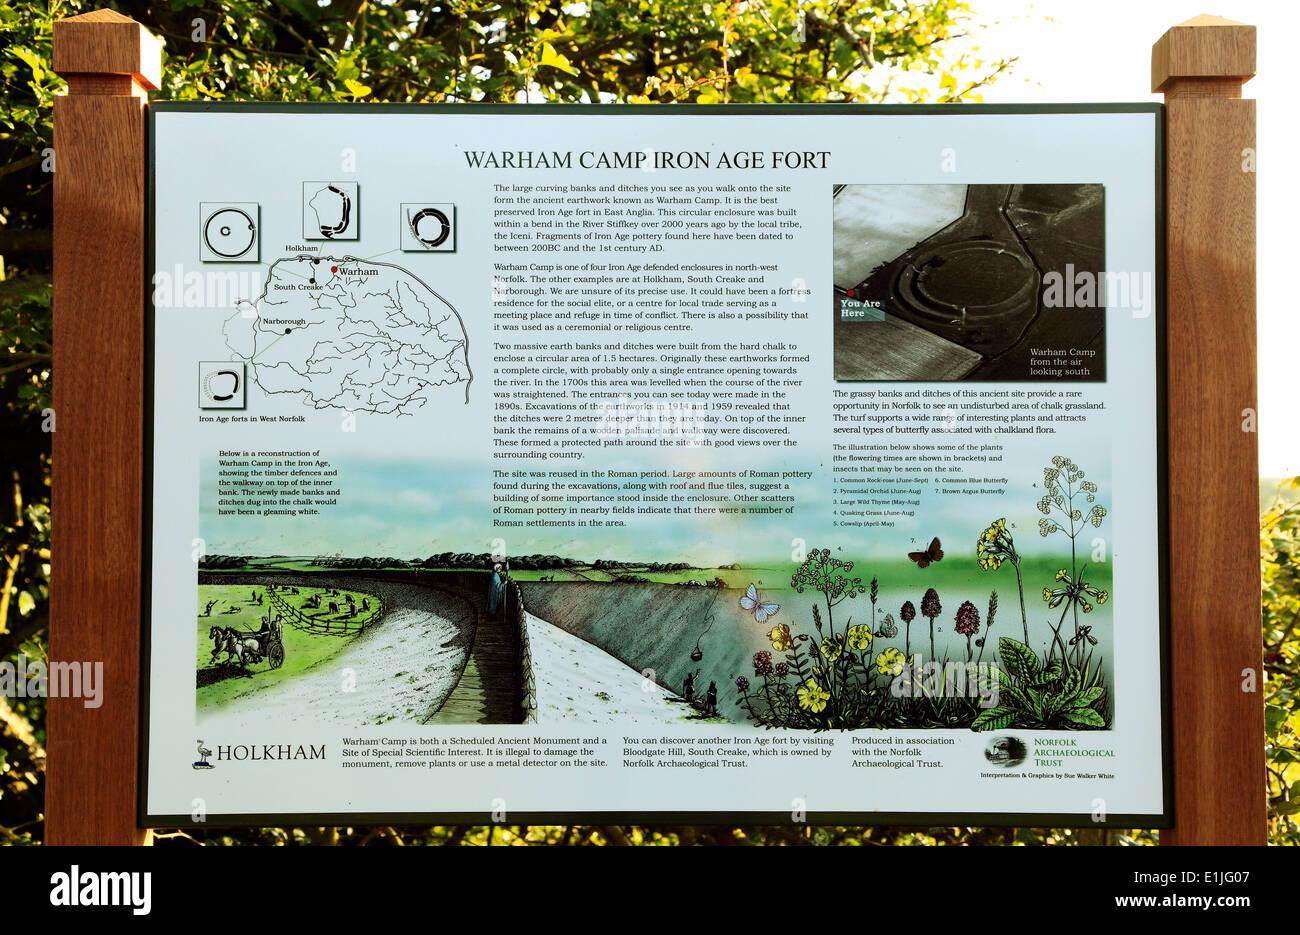 Warham Camp Iron Age Fort information panel, Norfolk prehistory, prehistoric England UK English forts - Stock Image